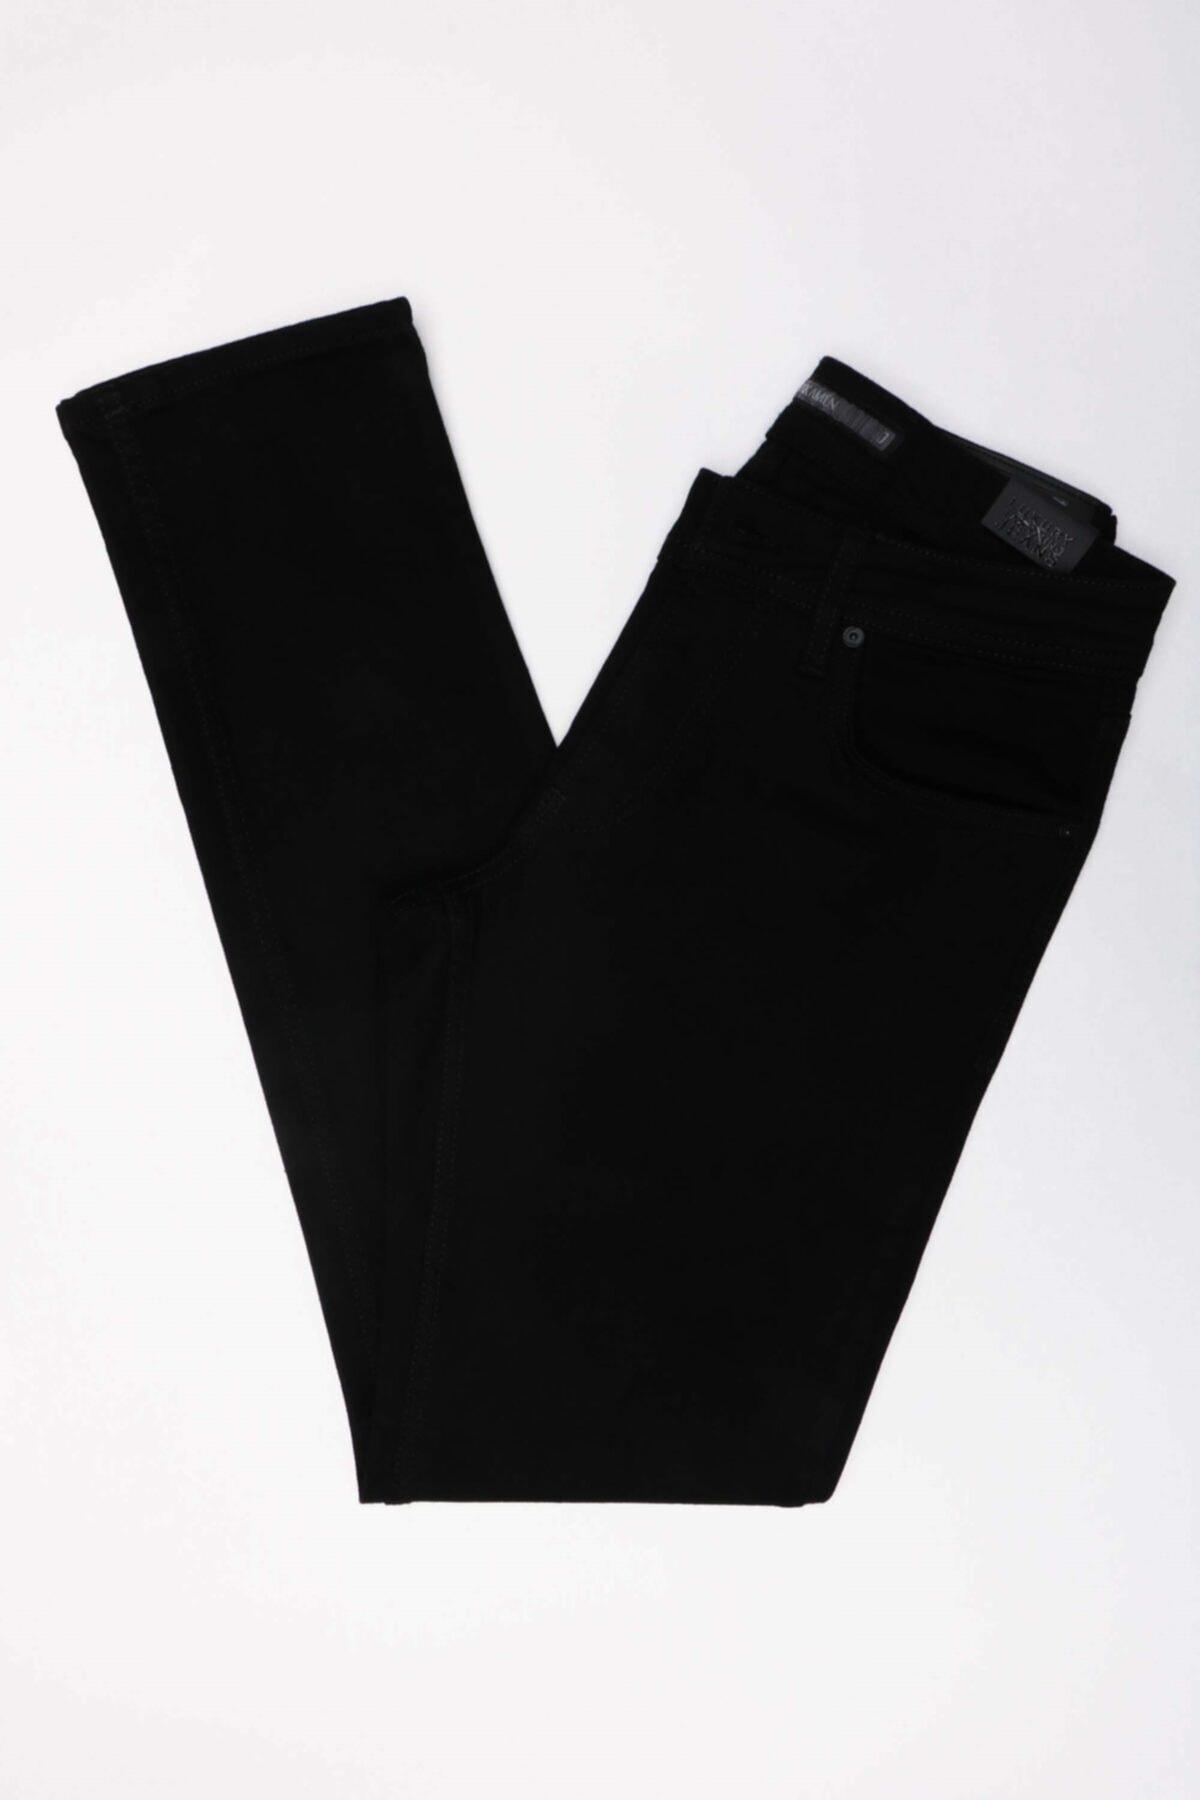 Jakamen Erkek Siyah Slim Beş Cep Jean Pantolon-01 Jk32sf43m025 1